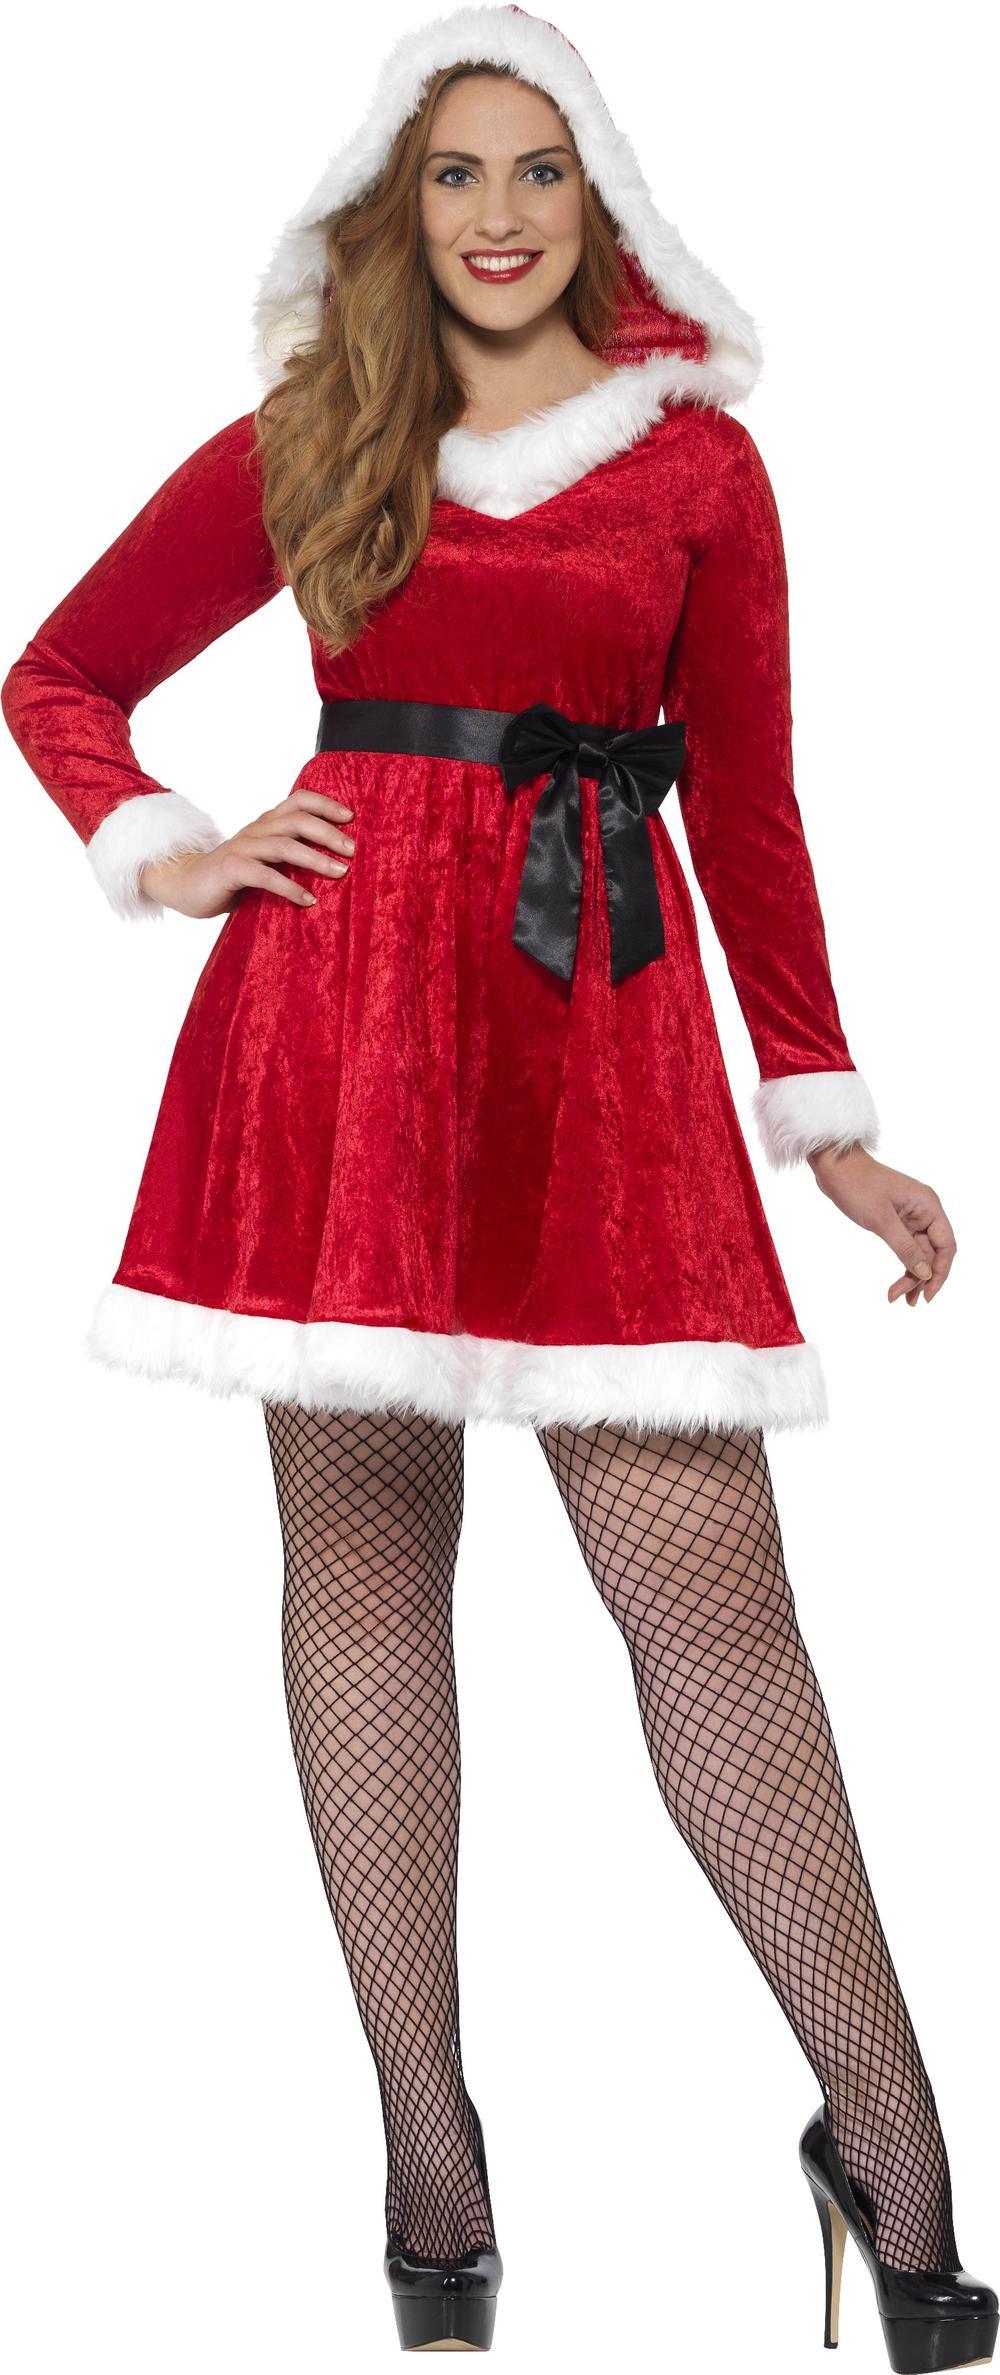 Miss Santa Costume Plus Size Ladies Fancy Dress Adults Christmas Costume Outfit